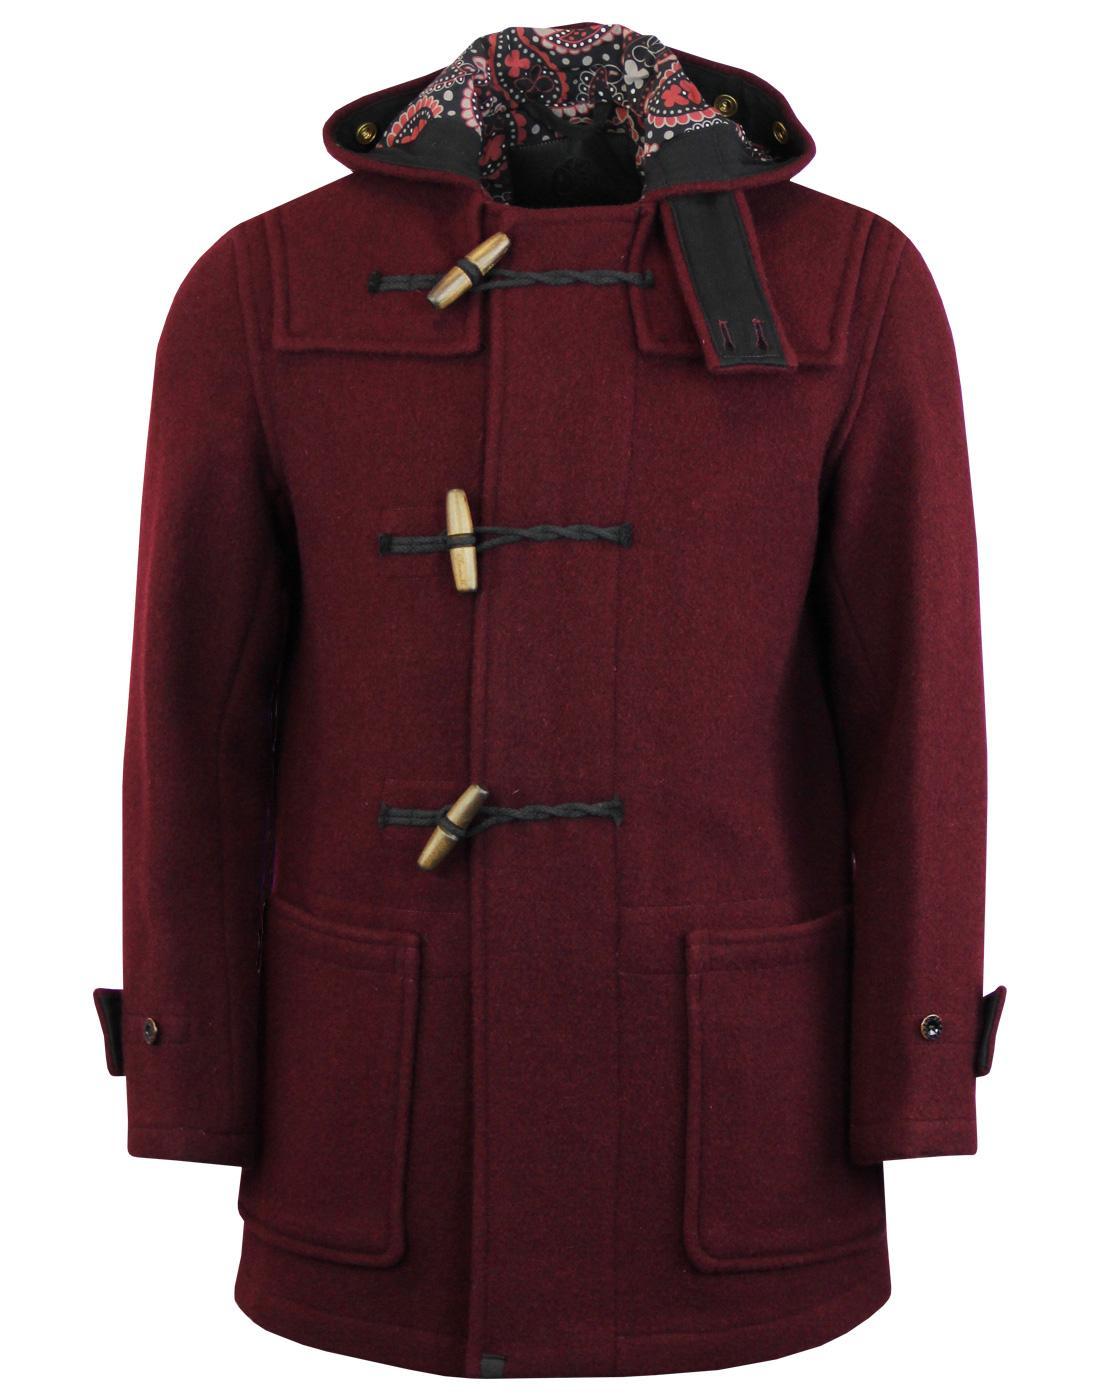 Monty Barrett GLOVERALL x PRETTY GREEN Duffle Coat